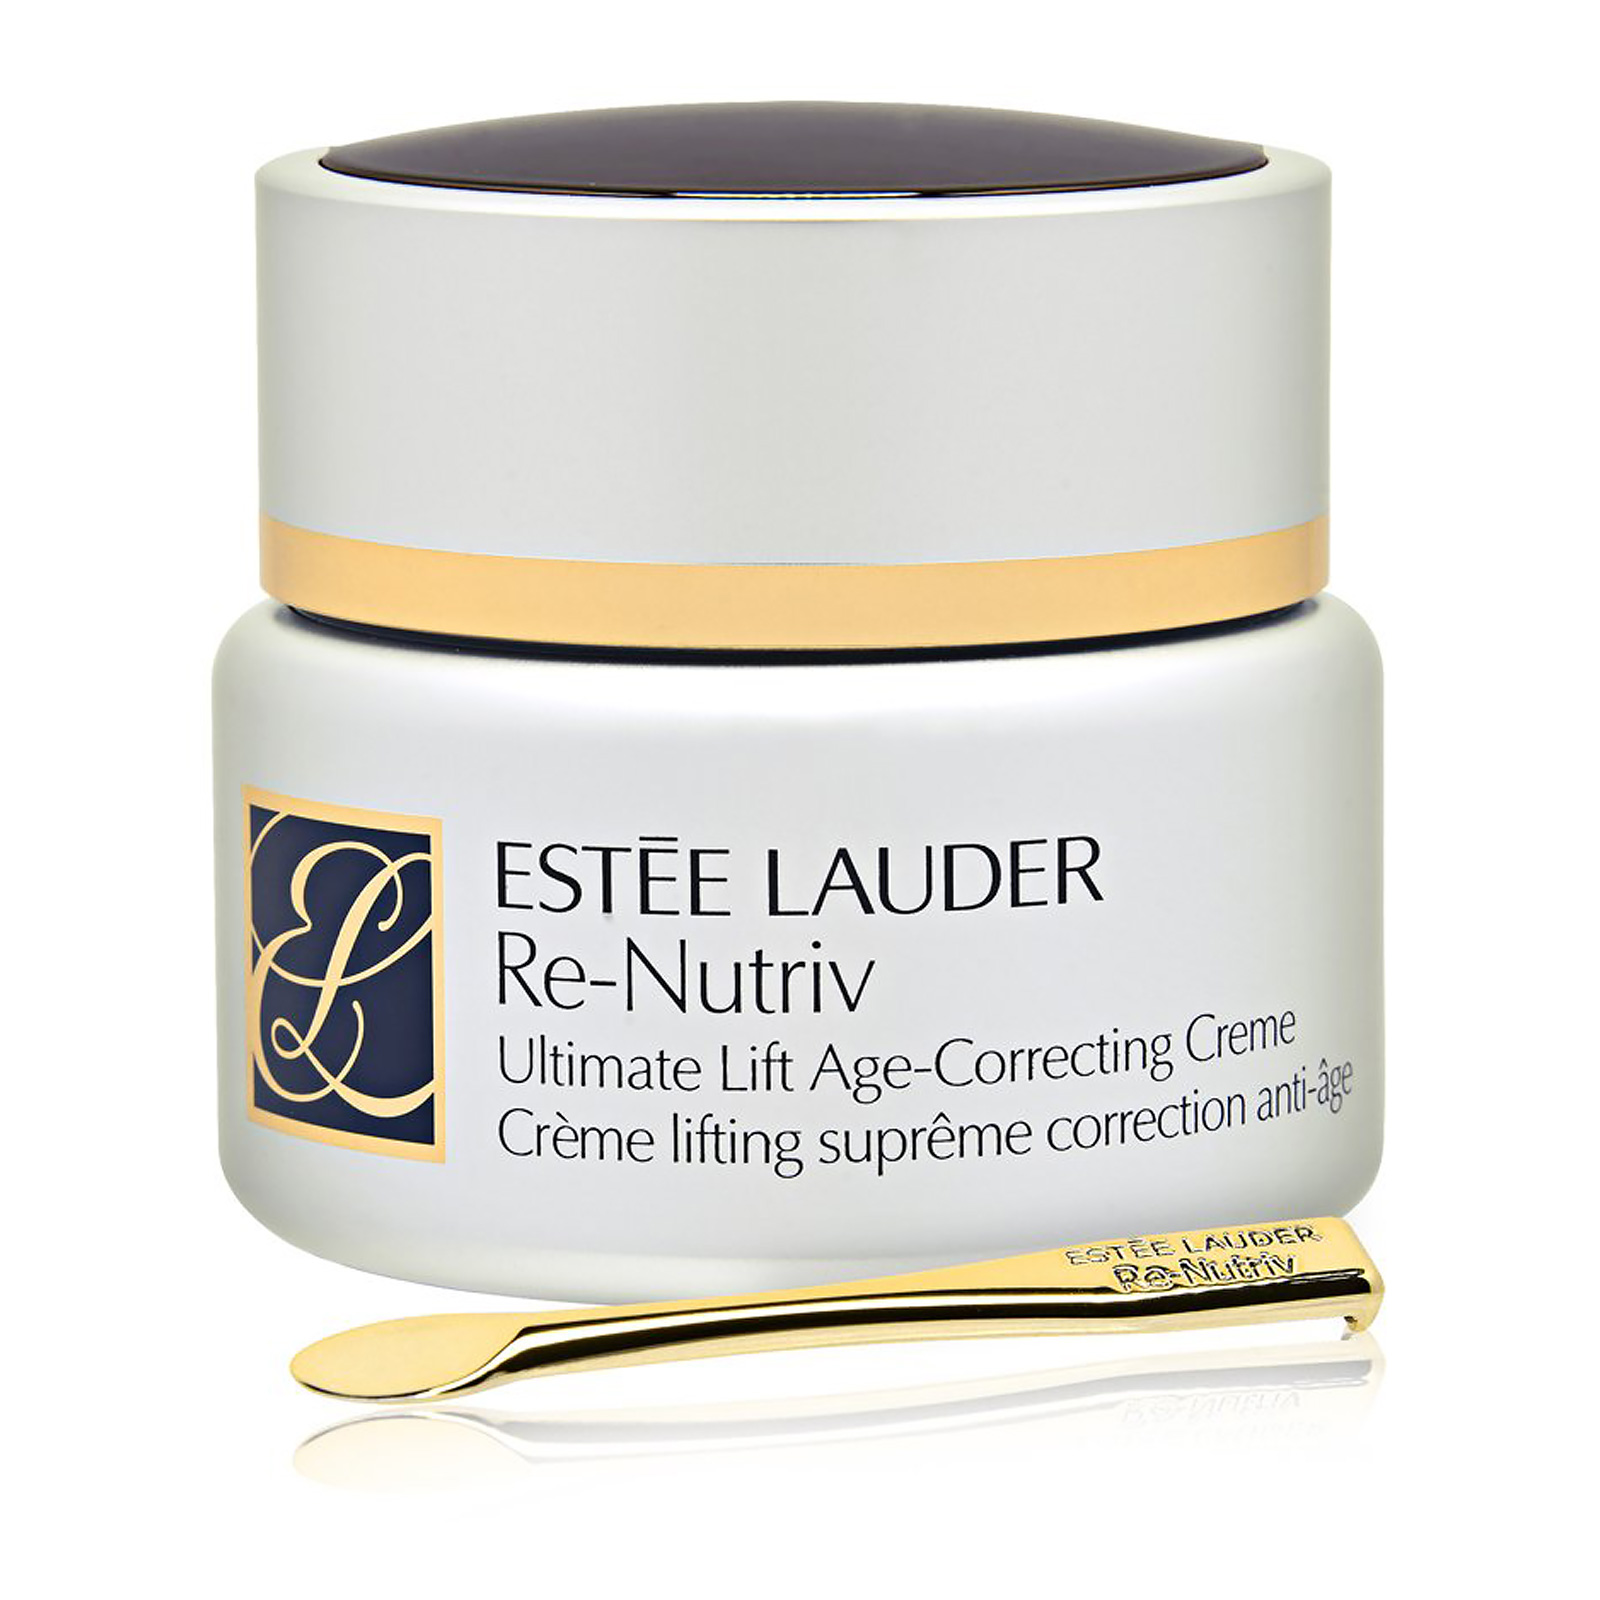 Re-Nutriv Ultimate Lift Age-Correcting Crème